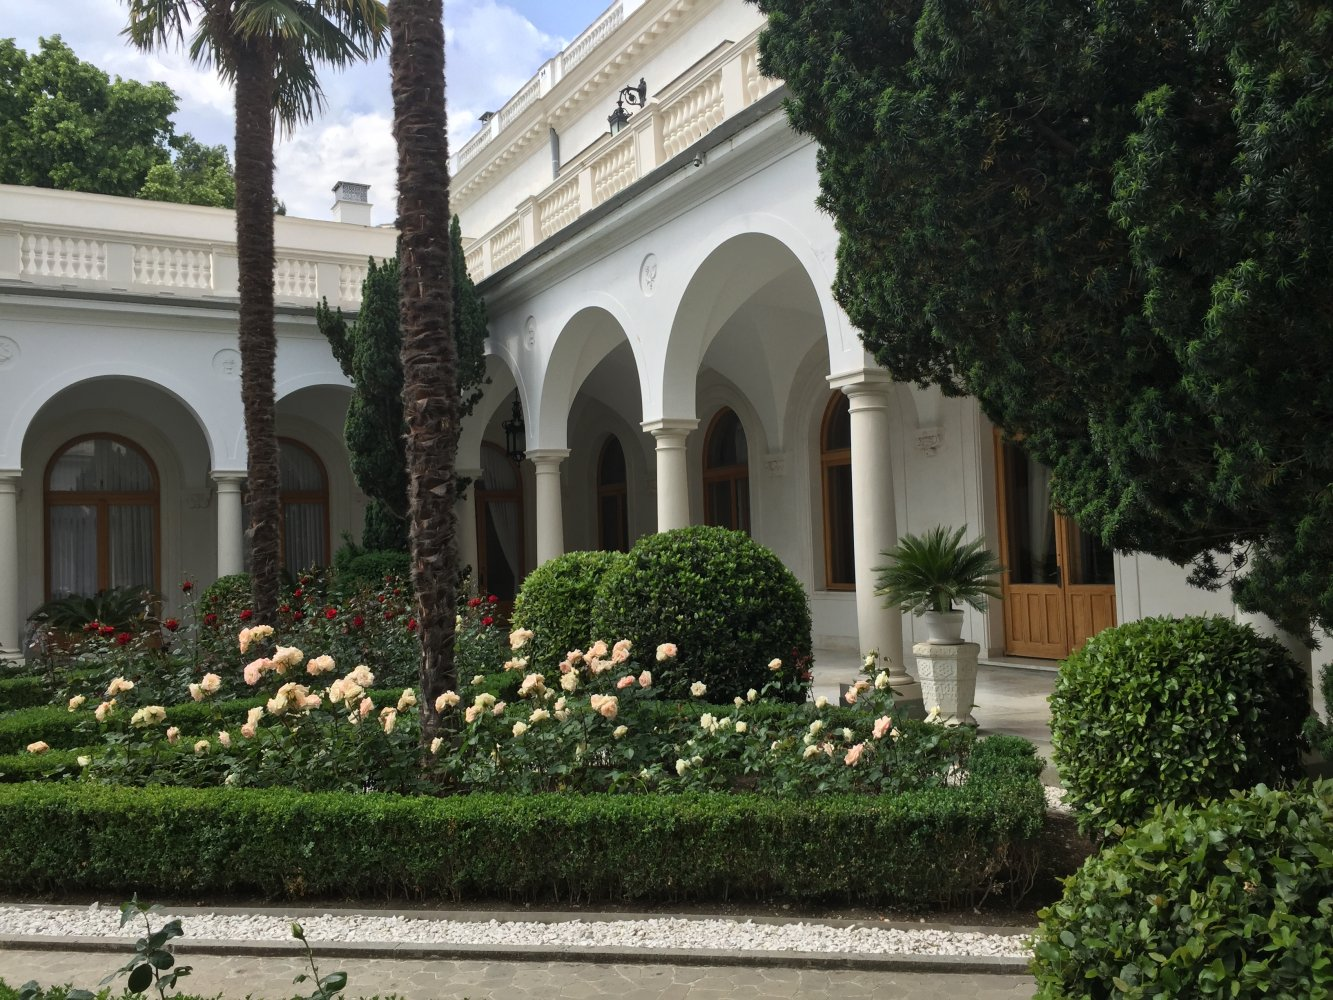 Картинки ливадийского дворца во дворе, рождения офиса